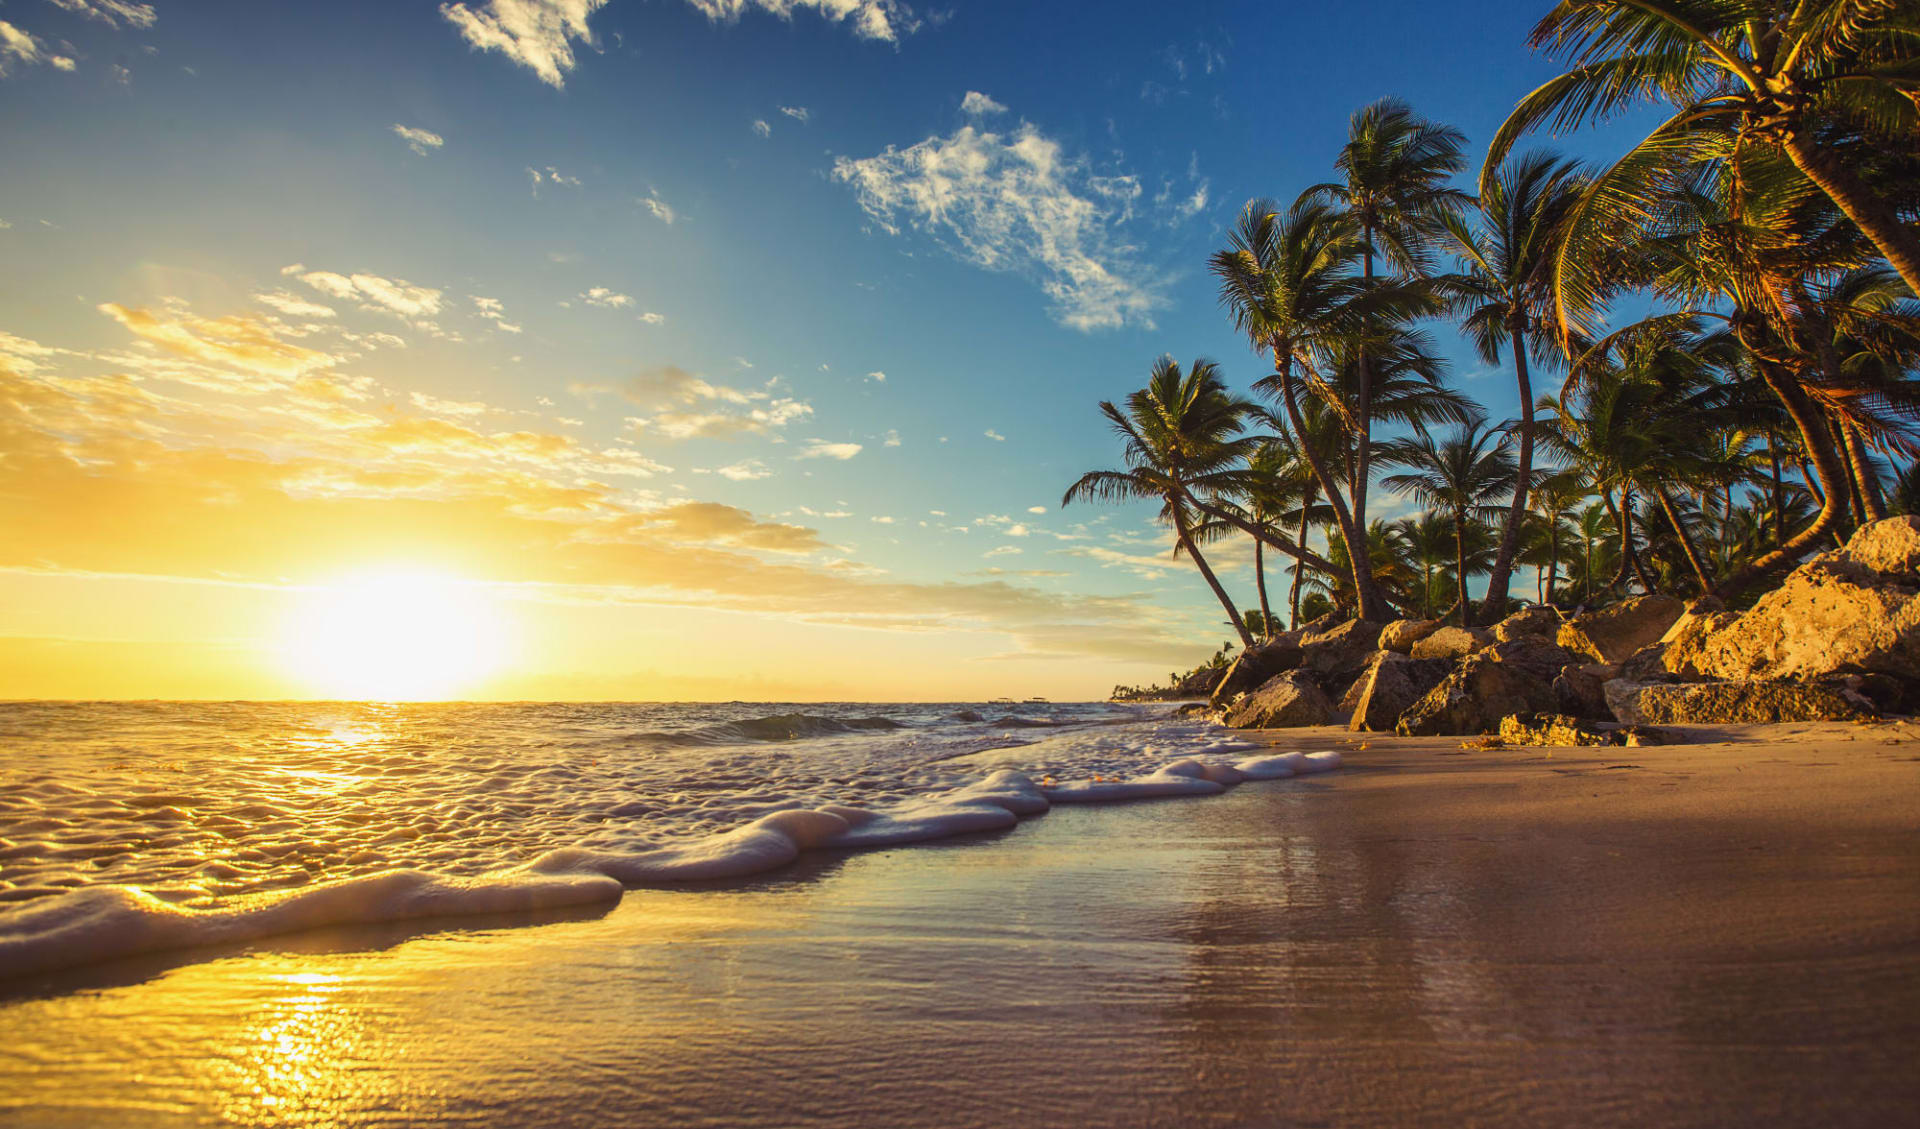 Aktivprogramm Samana ab Las Terrenas: Dominikanische Republik - Strand - Sonnenuntergang